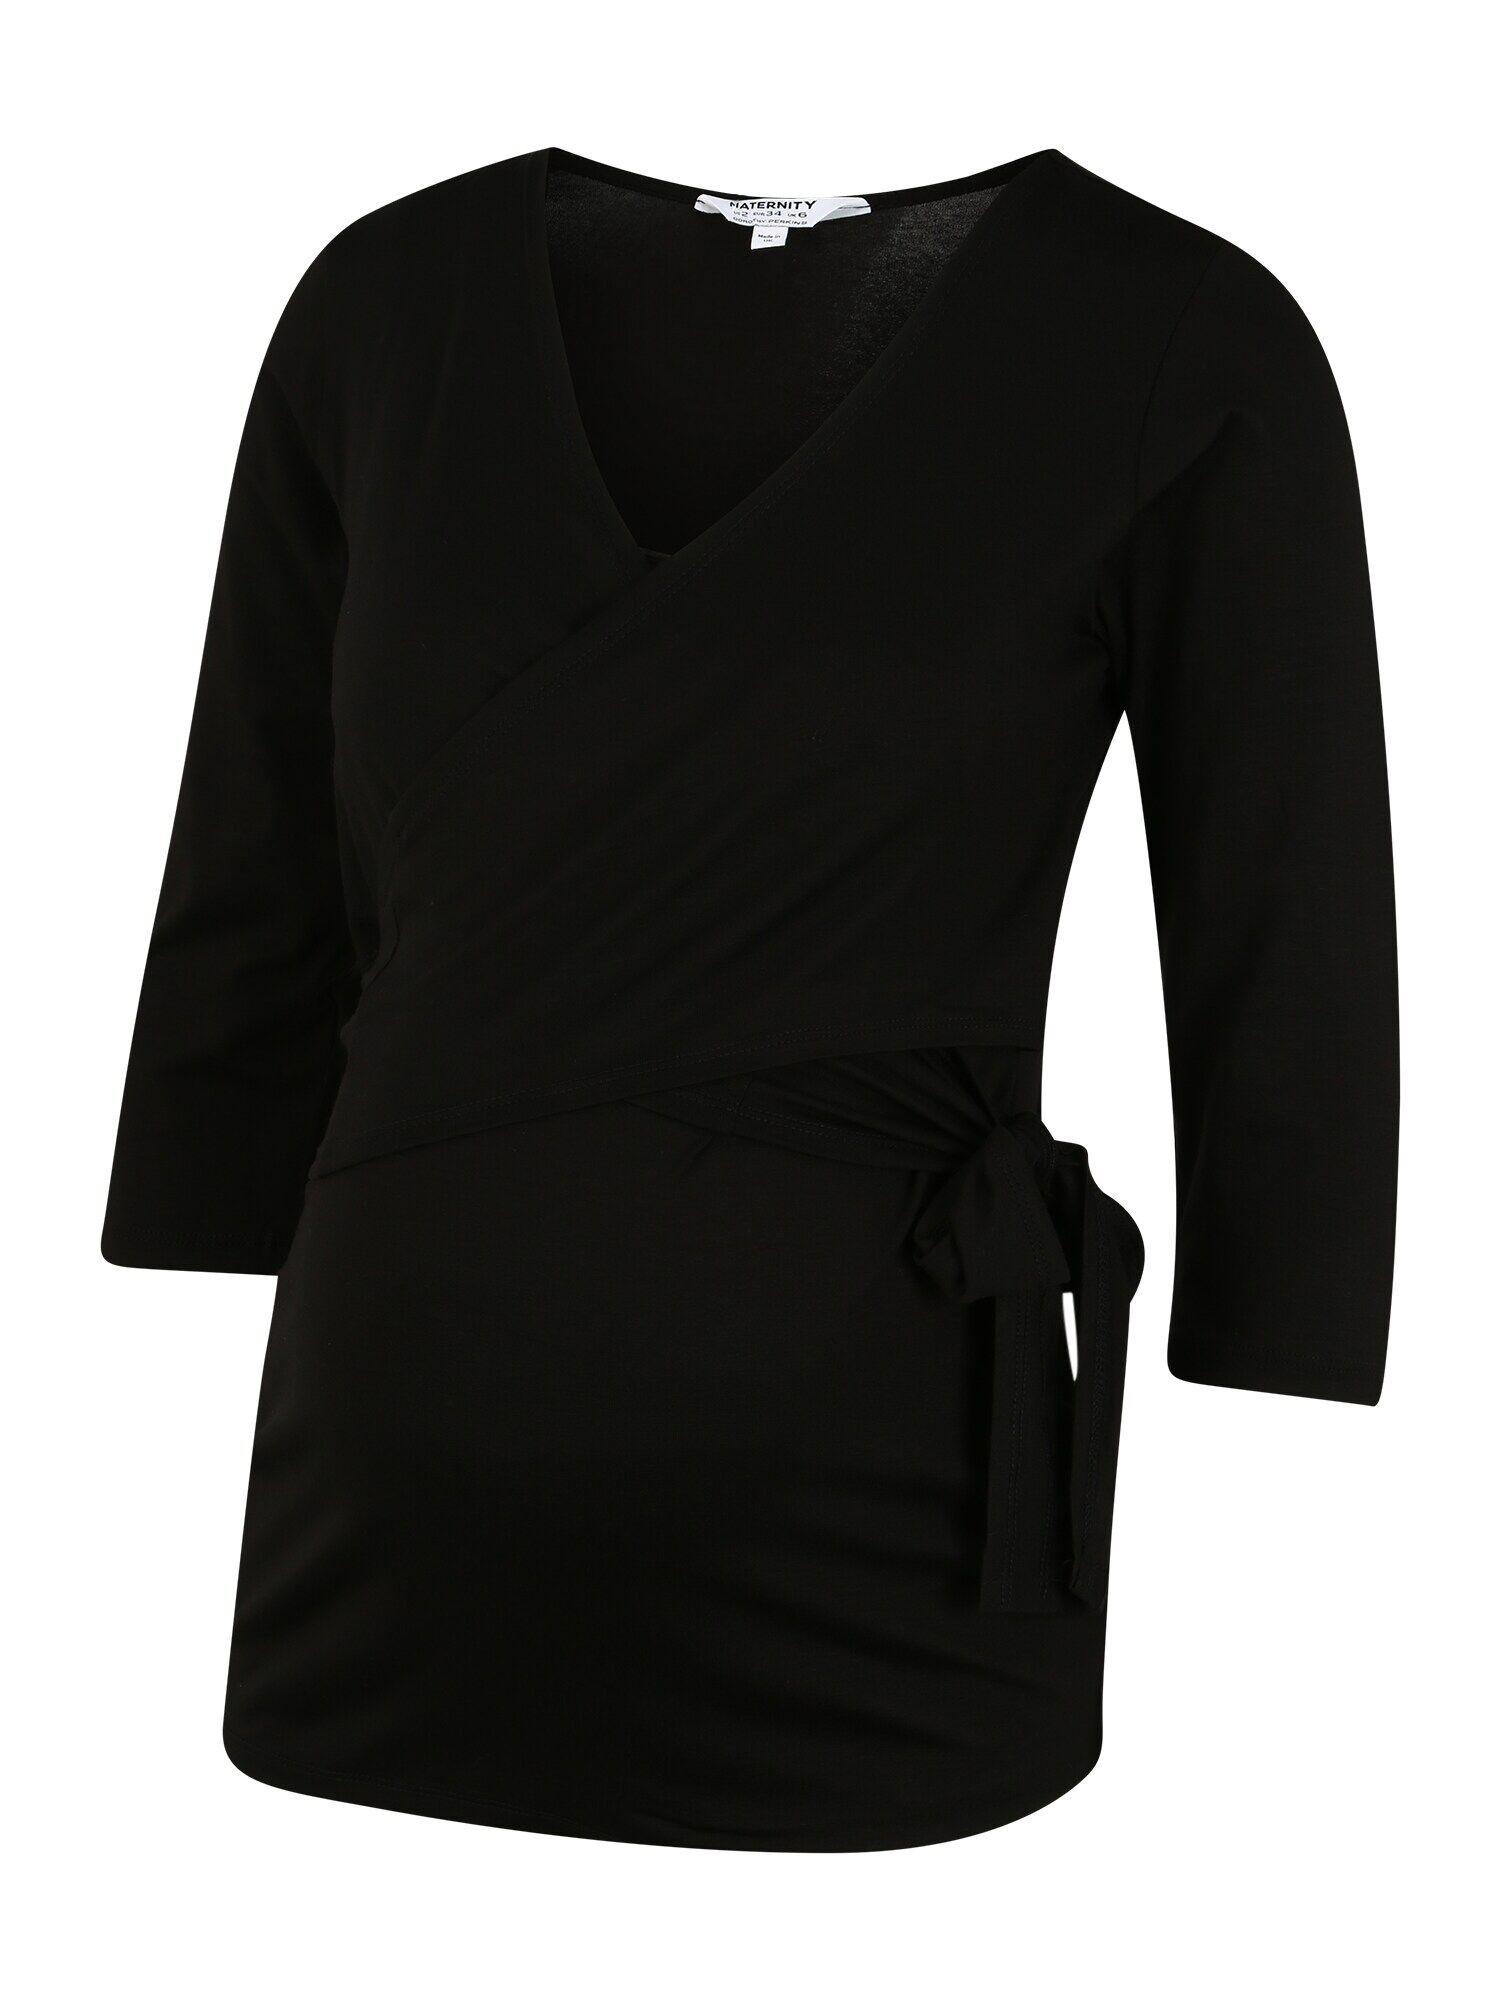 Dorothy Perkins Maternity T-shirt  - Noir - Taille: XS - female